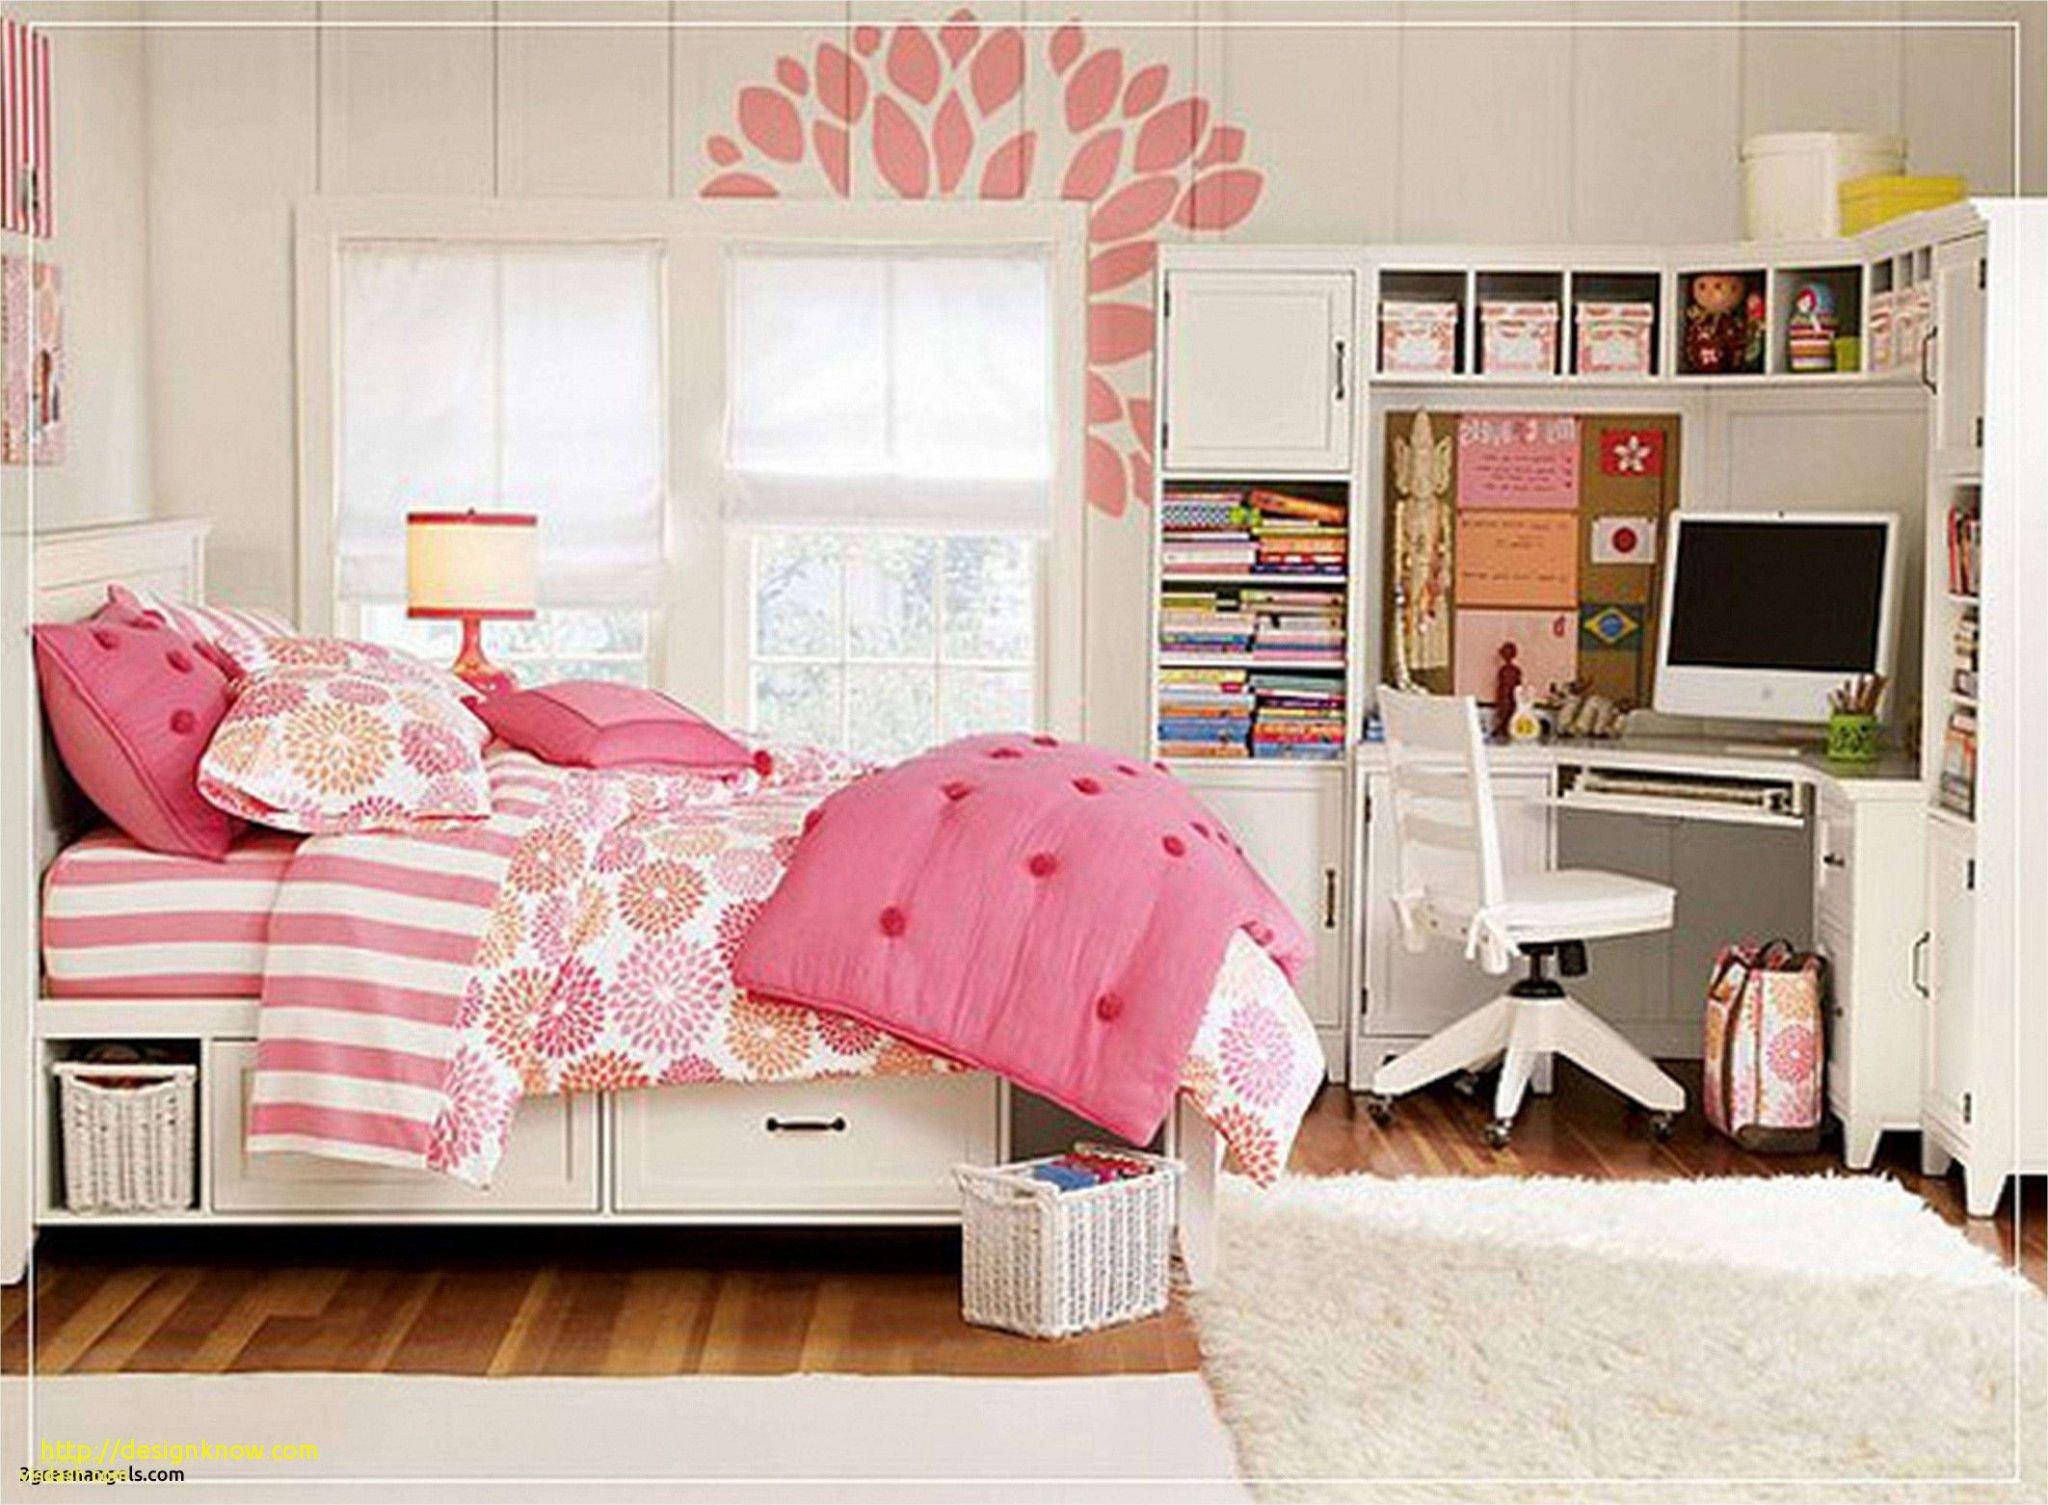 King Bedroom Furniture Set Inspirational Unique Interior Design for Small Size Bedroom